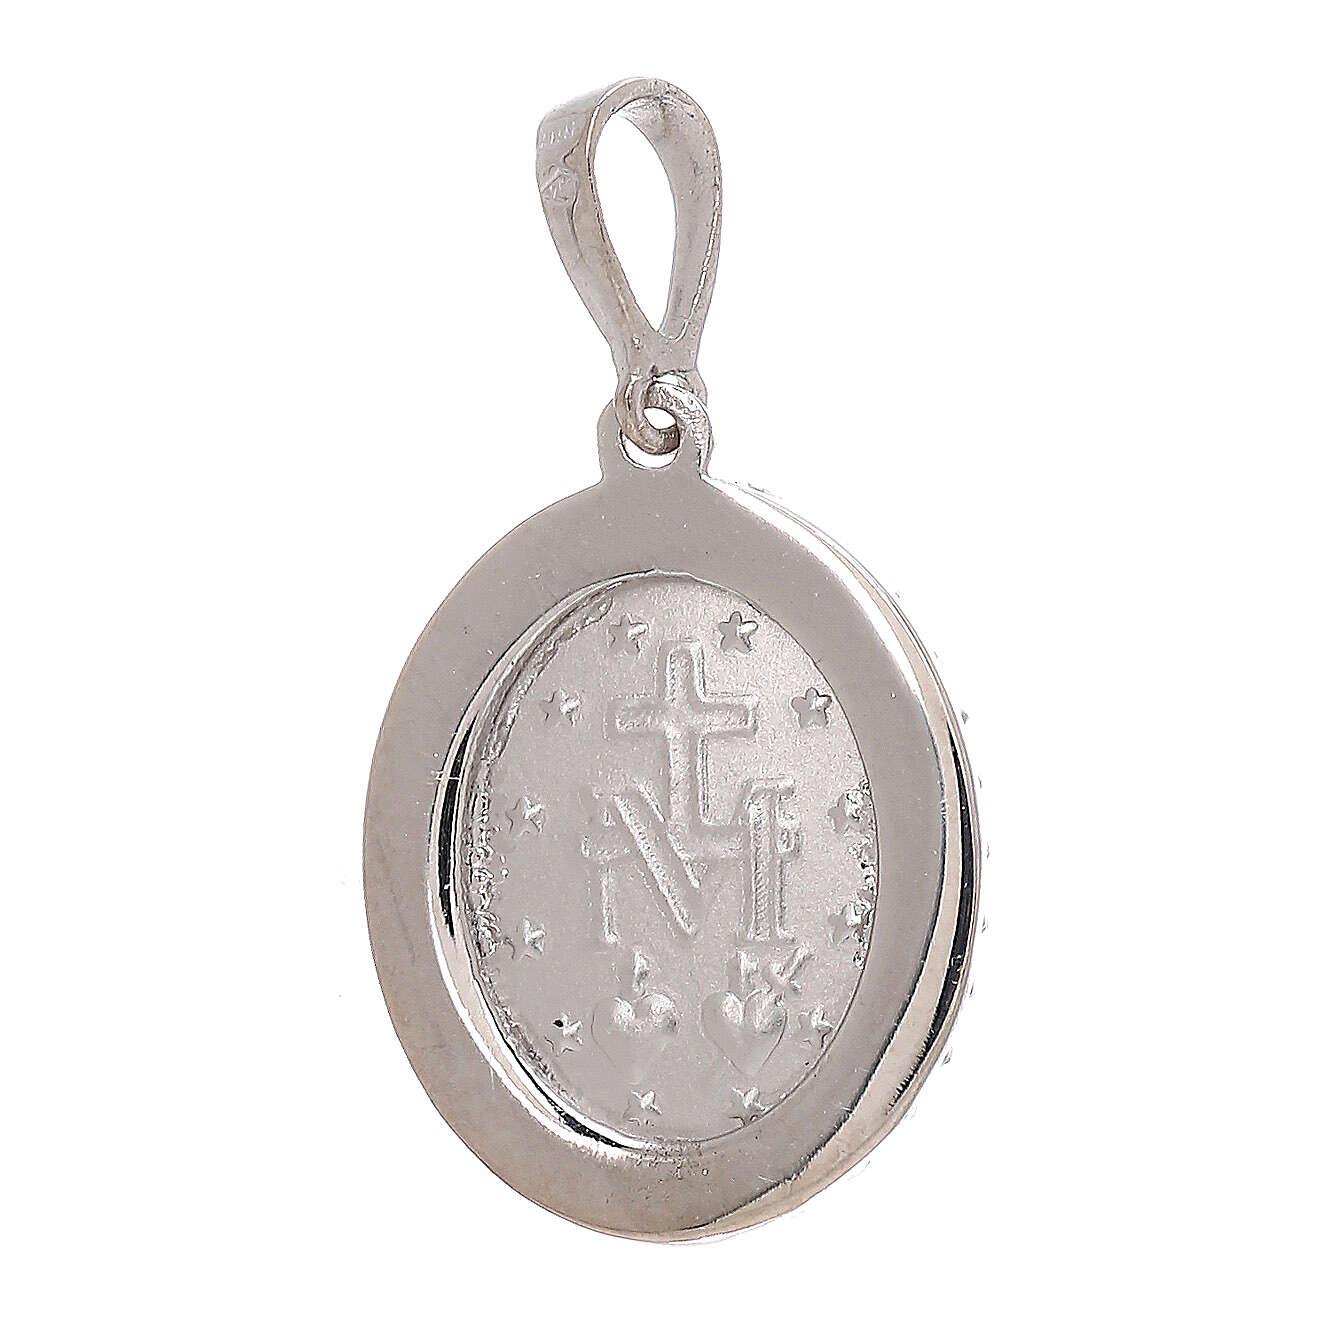 Colgante Medalla Milagrosa oro blanco 18 quilates Swarovski 2,5 gramos 4